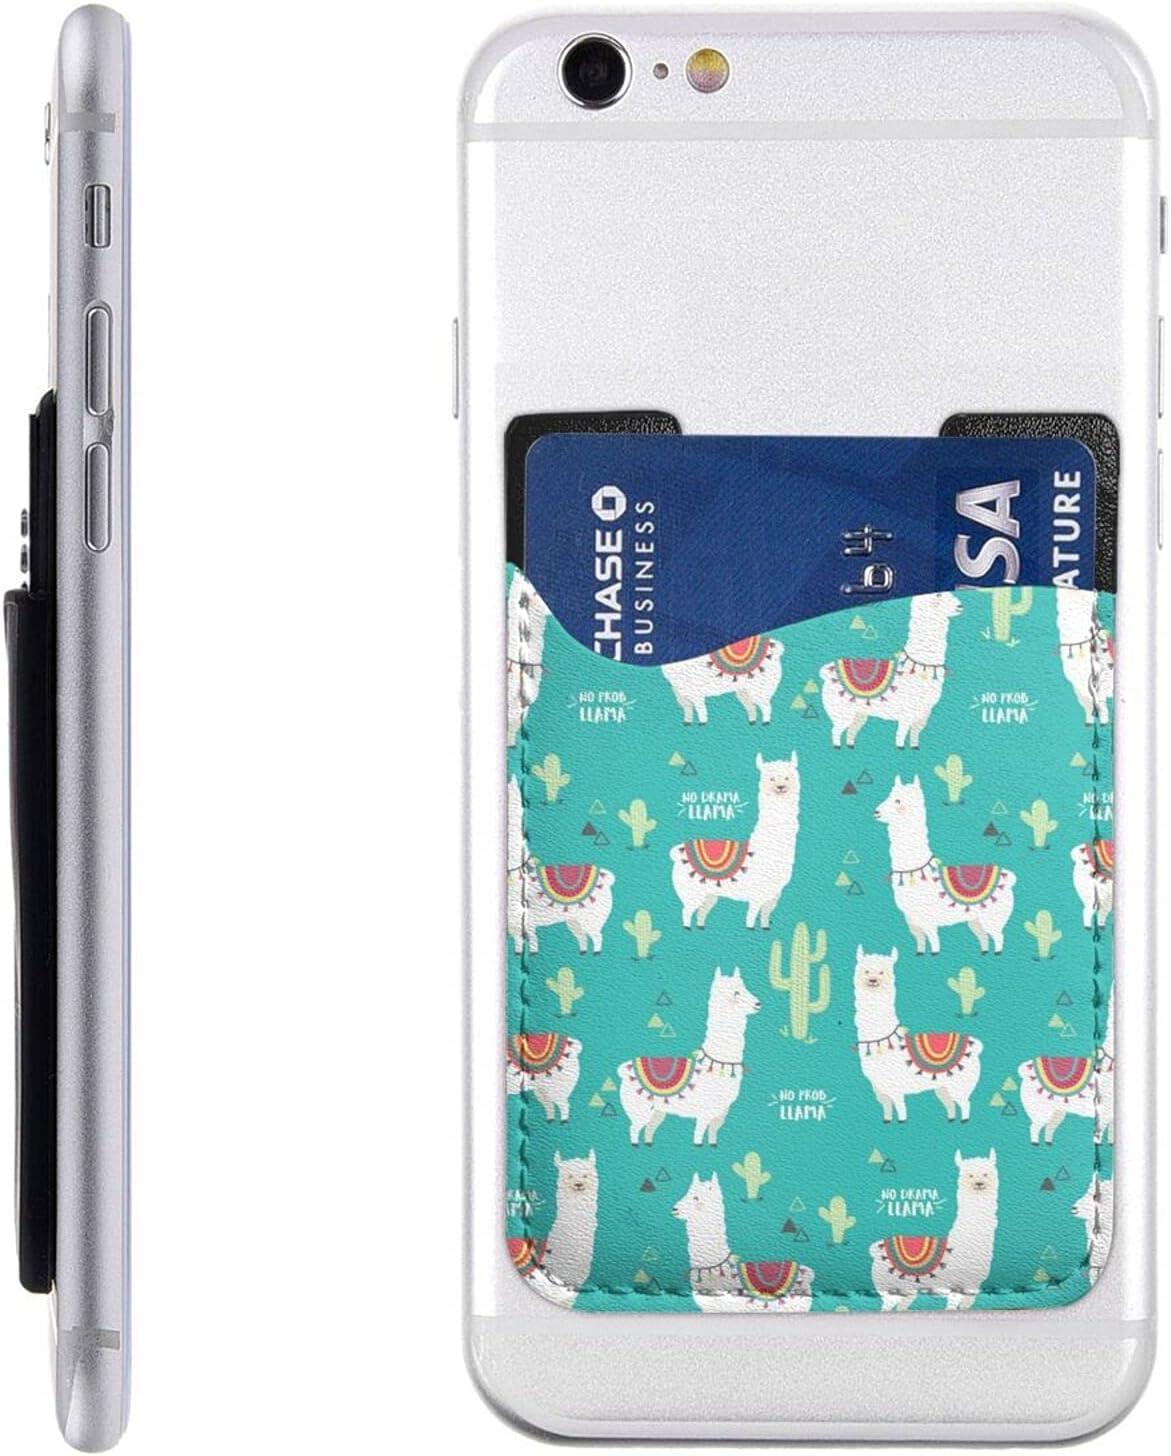 Cute White Llama Las Vegas Mall and Cactus Charlotte Mall Phone Card Stick Holder O Cell